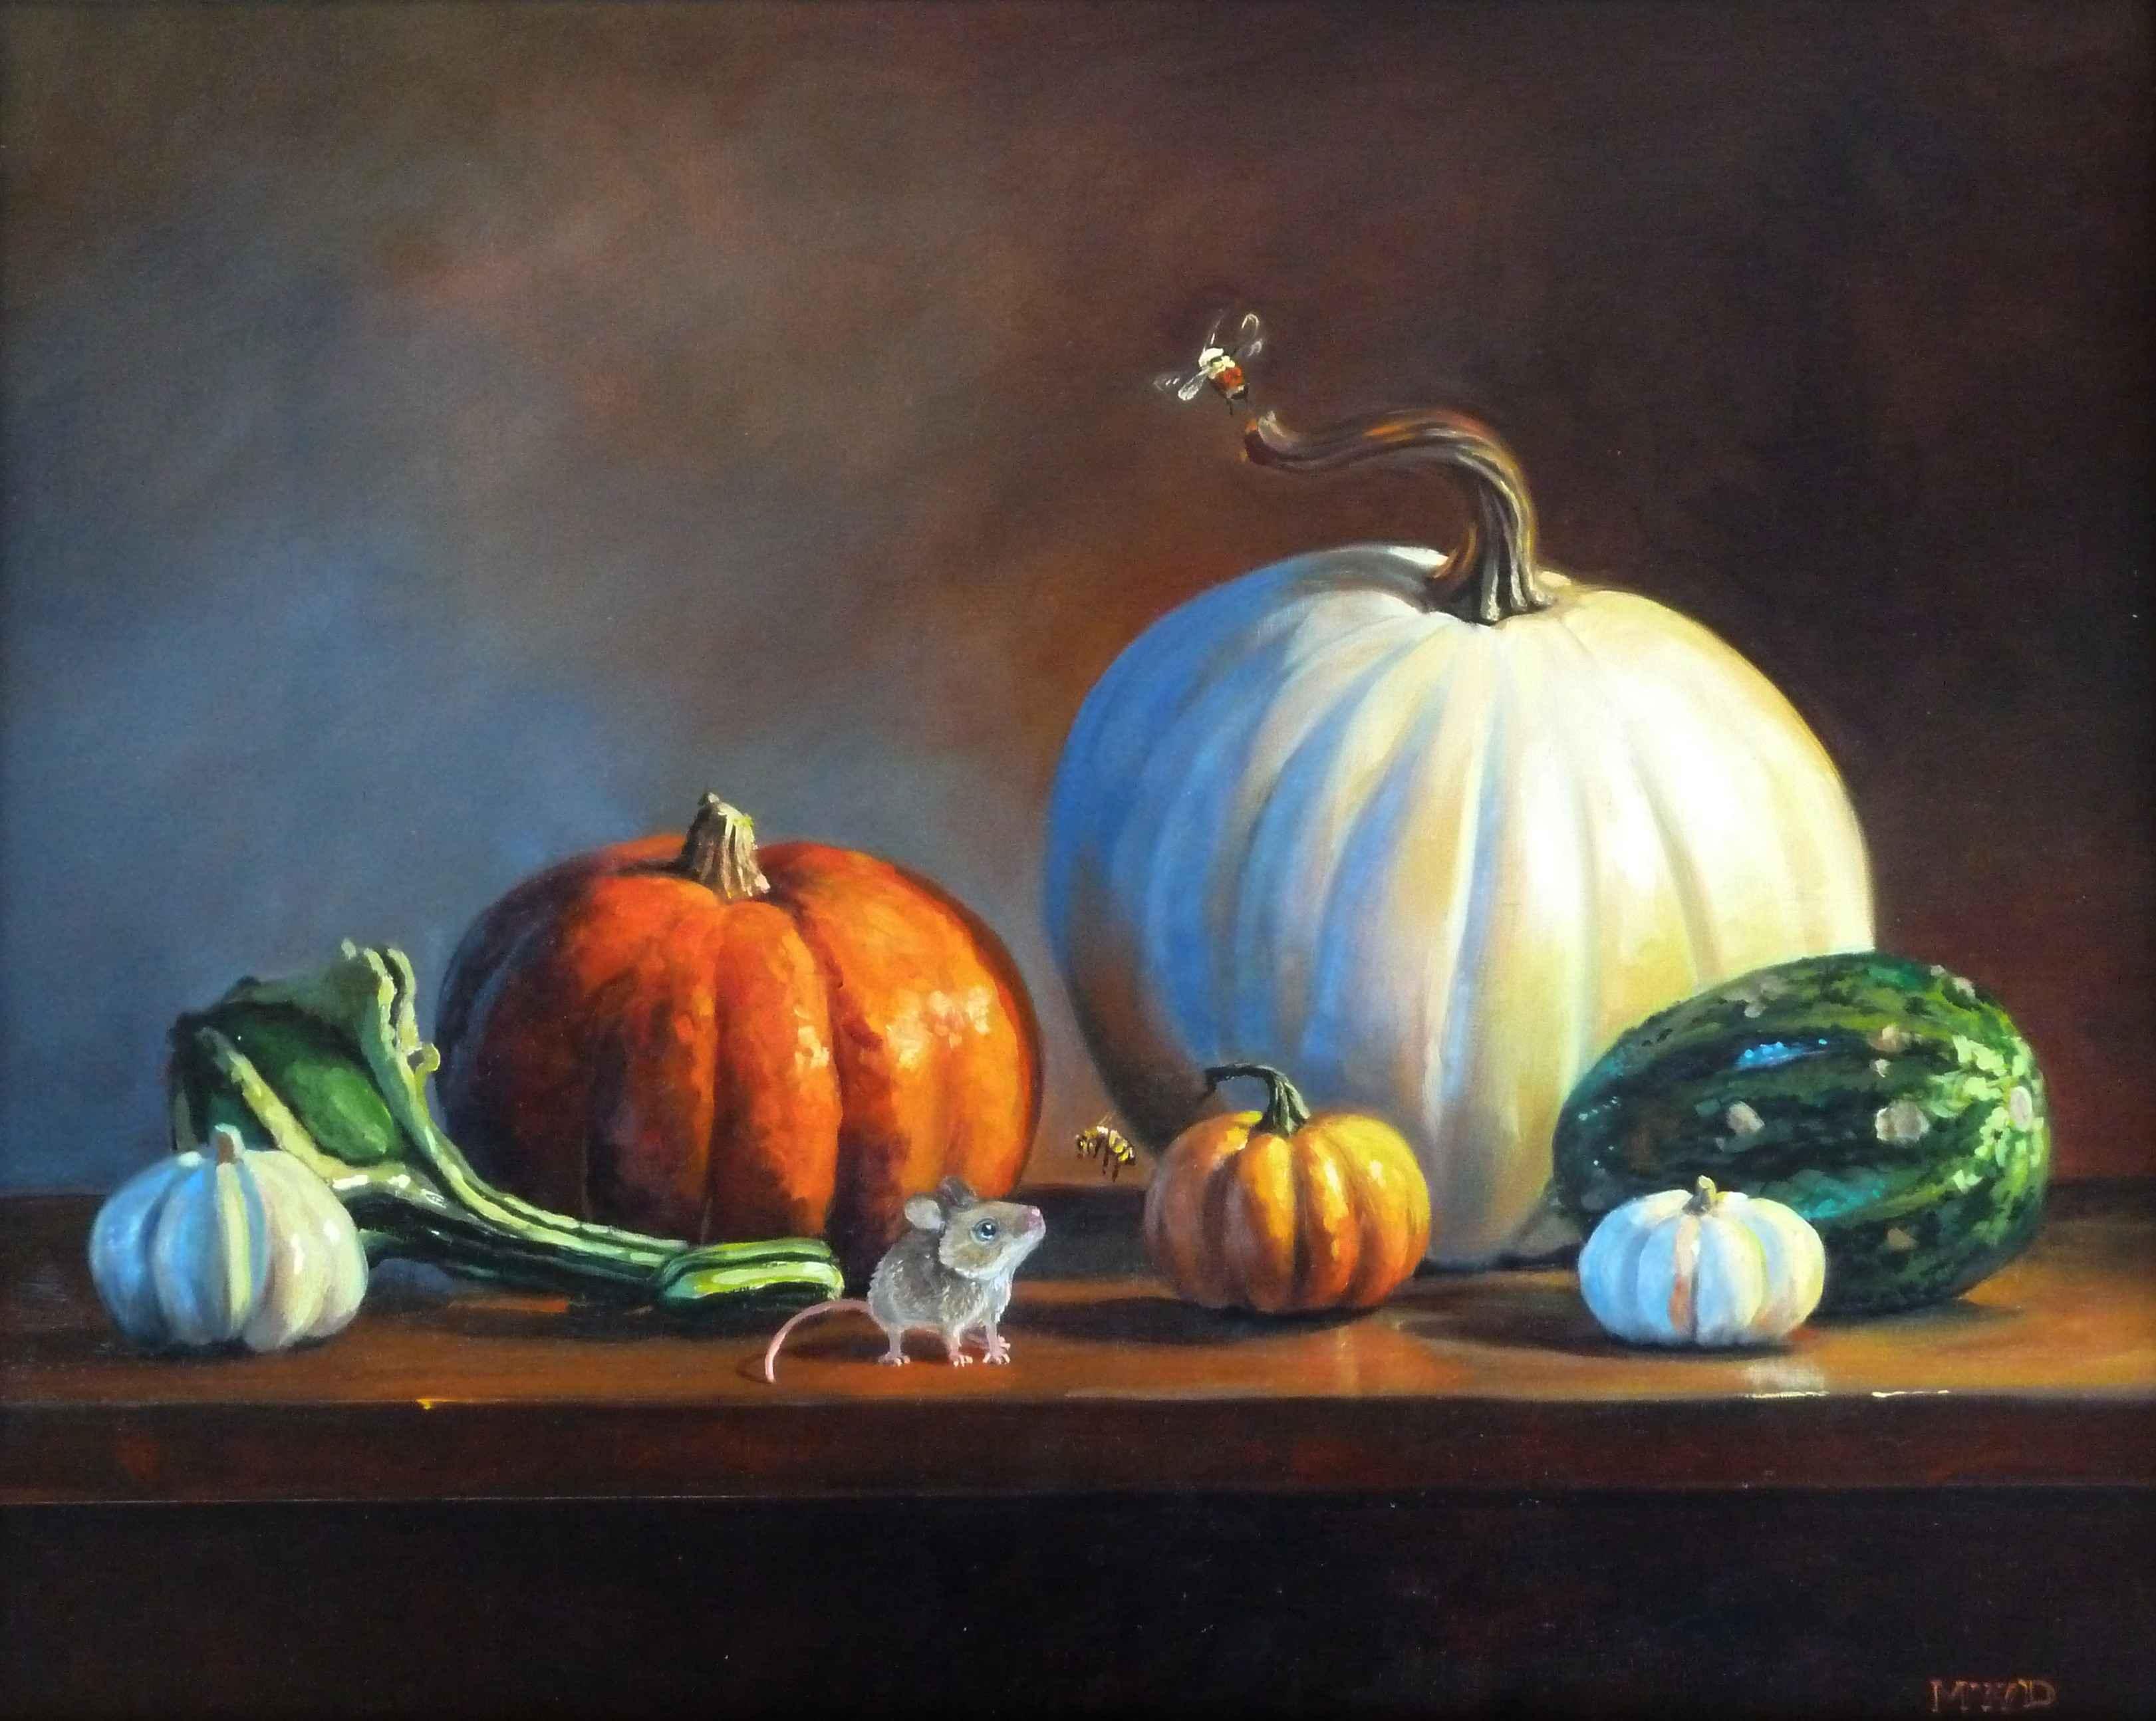 Friendly Encounter by  Michelle Waldele - Masterpiece Online